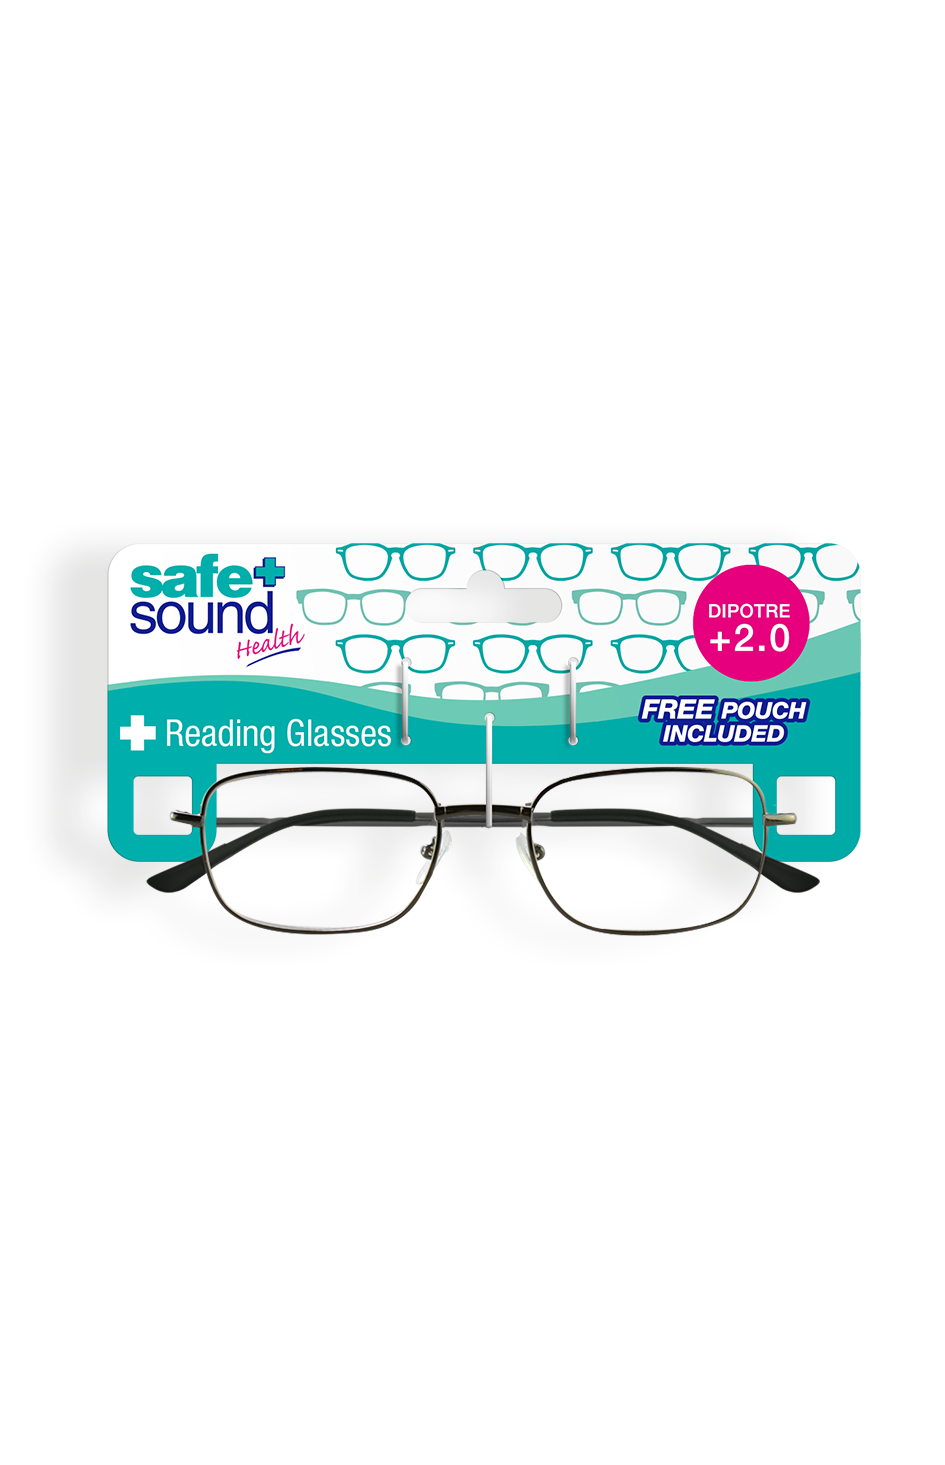 Safe and Sound Health Matt Black Reading Glasses 2.0 Dioptre